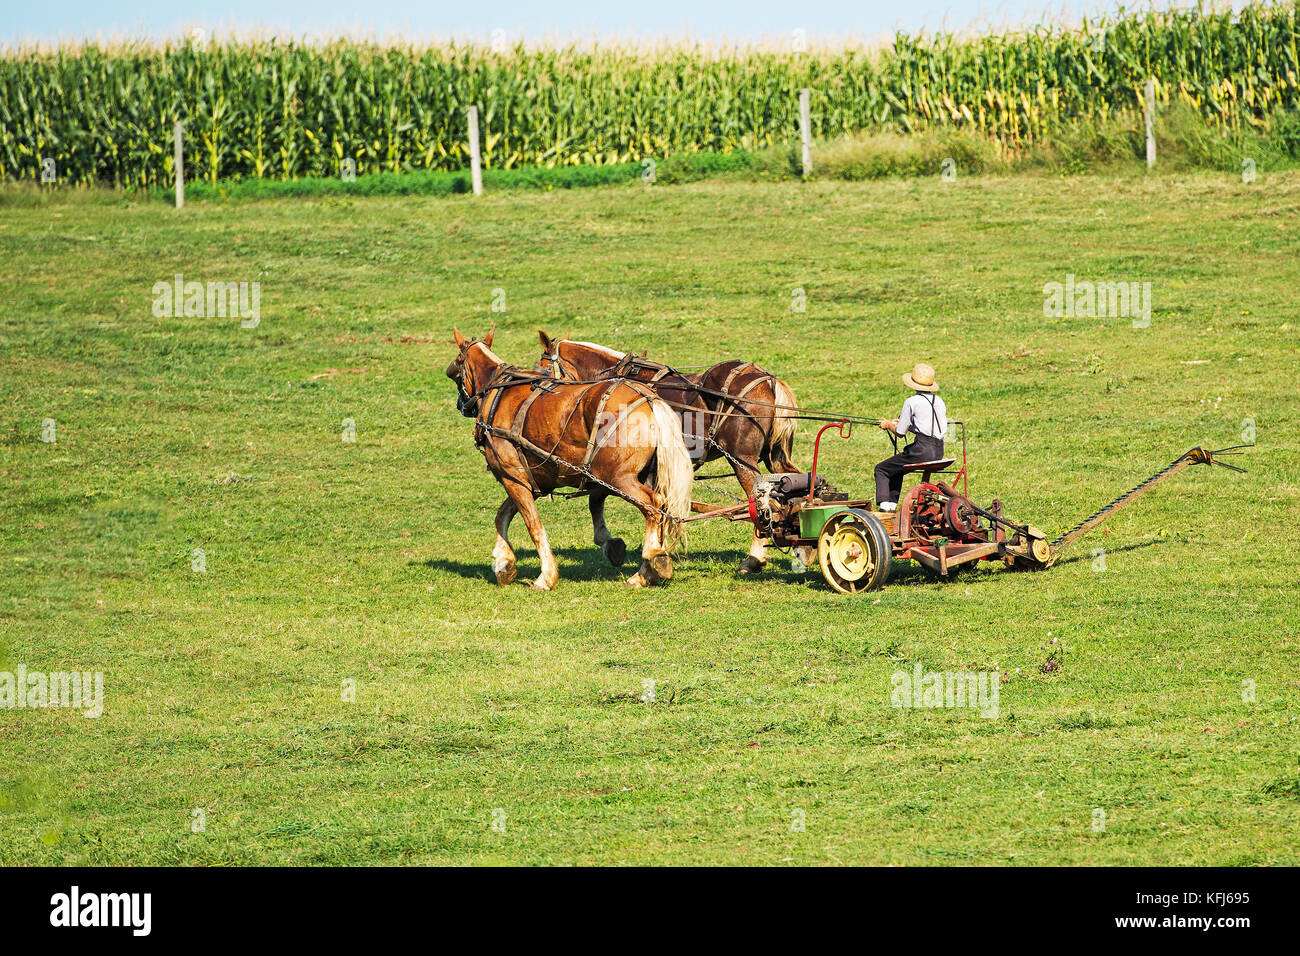 Amish Farmer Ploqing the Land - Stock Image